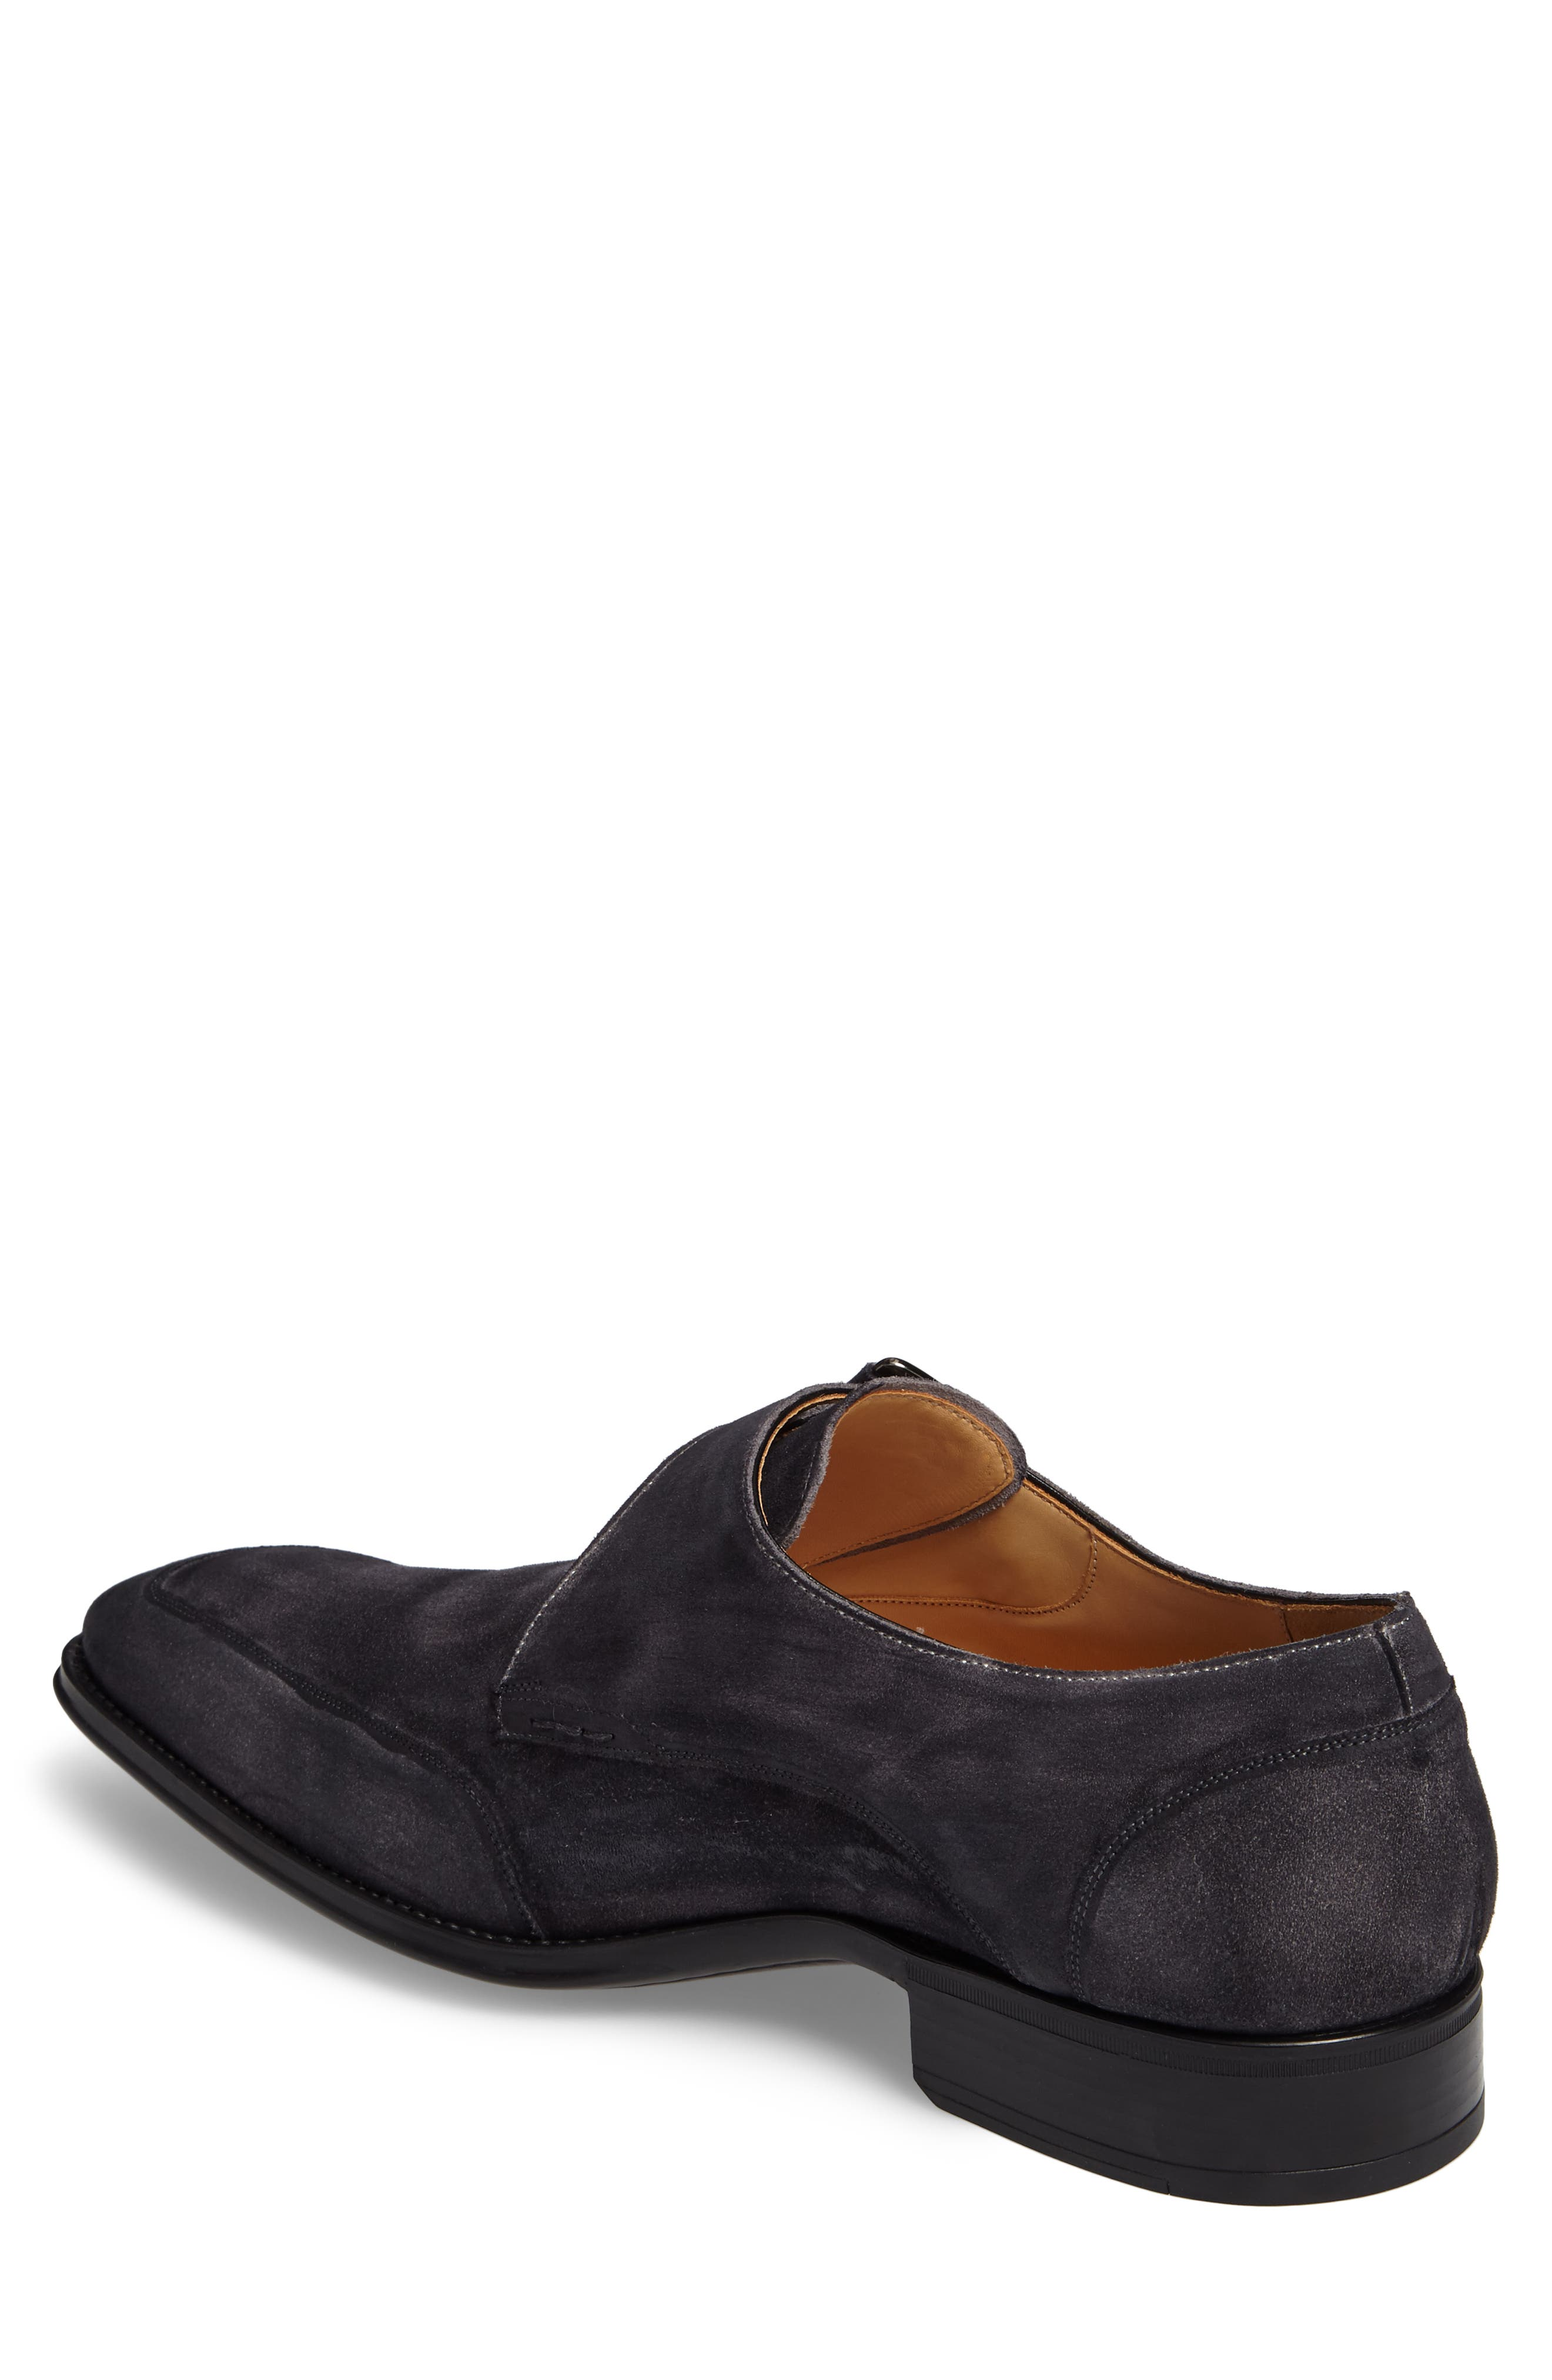 Baza Monk Strap Shoe,                             Alternate thumbnail 2, color,                             020